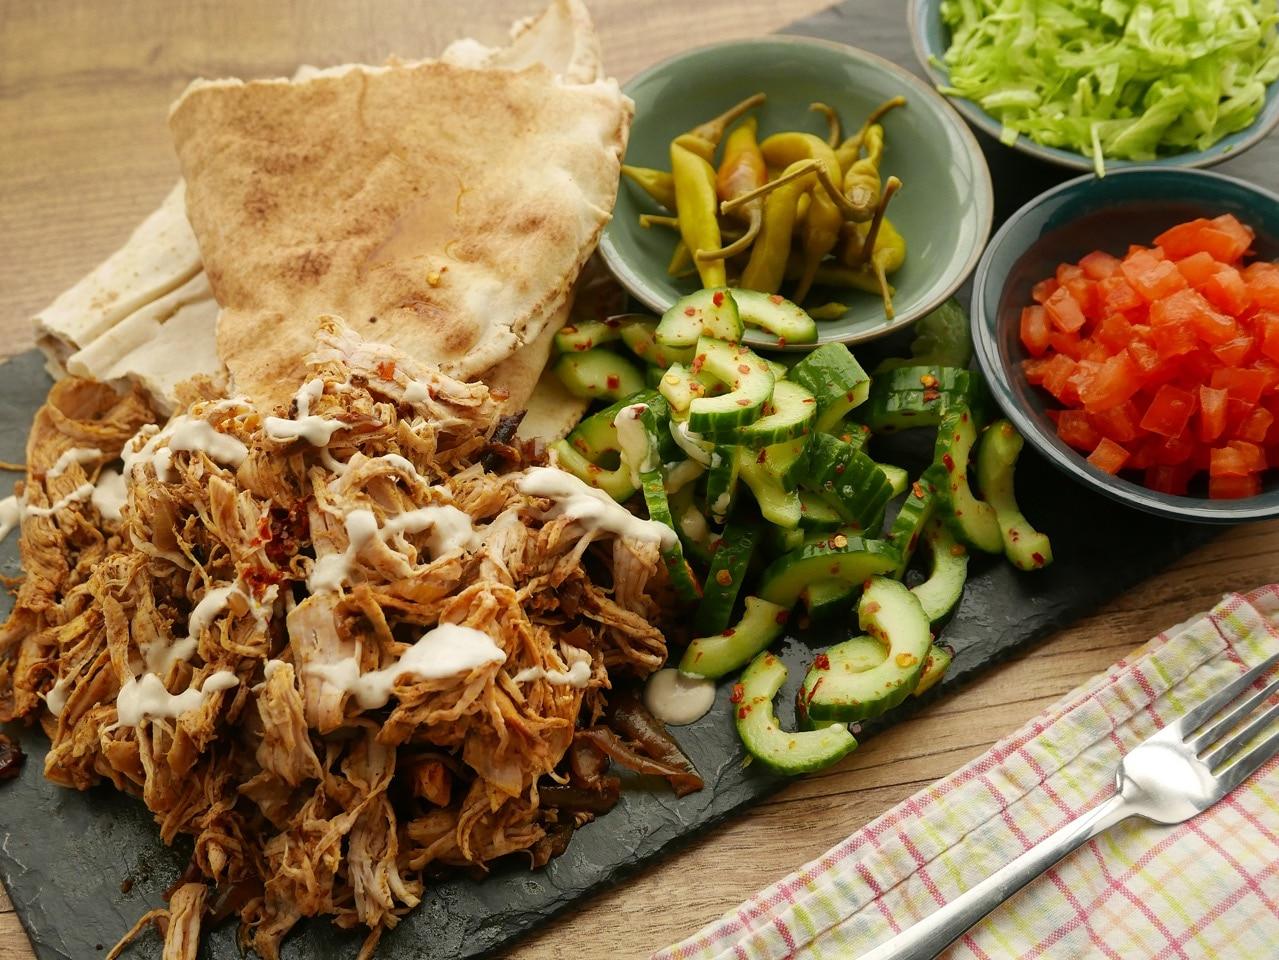 Turkey Shawarma with Cucumber Salad